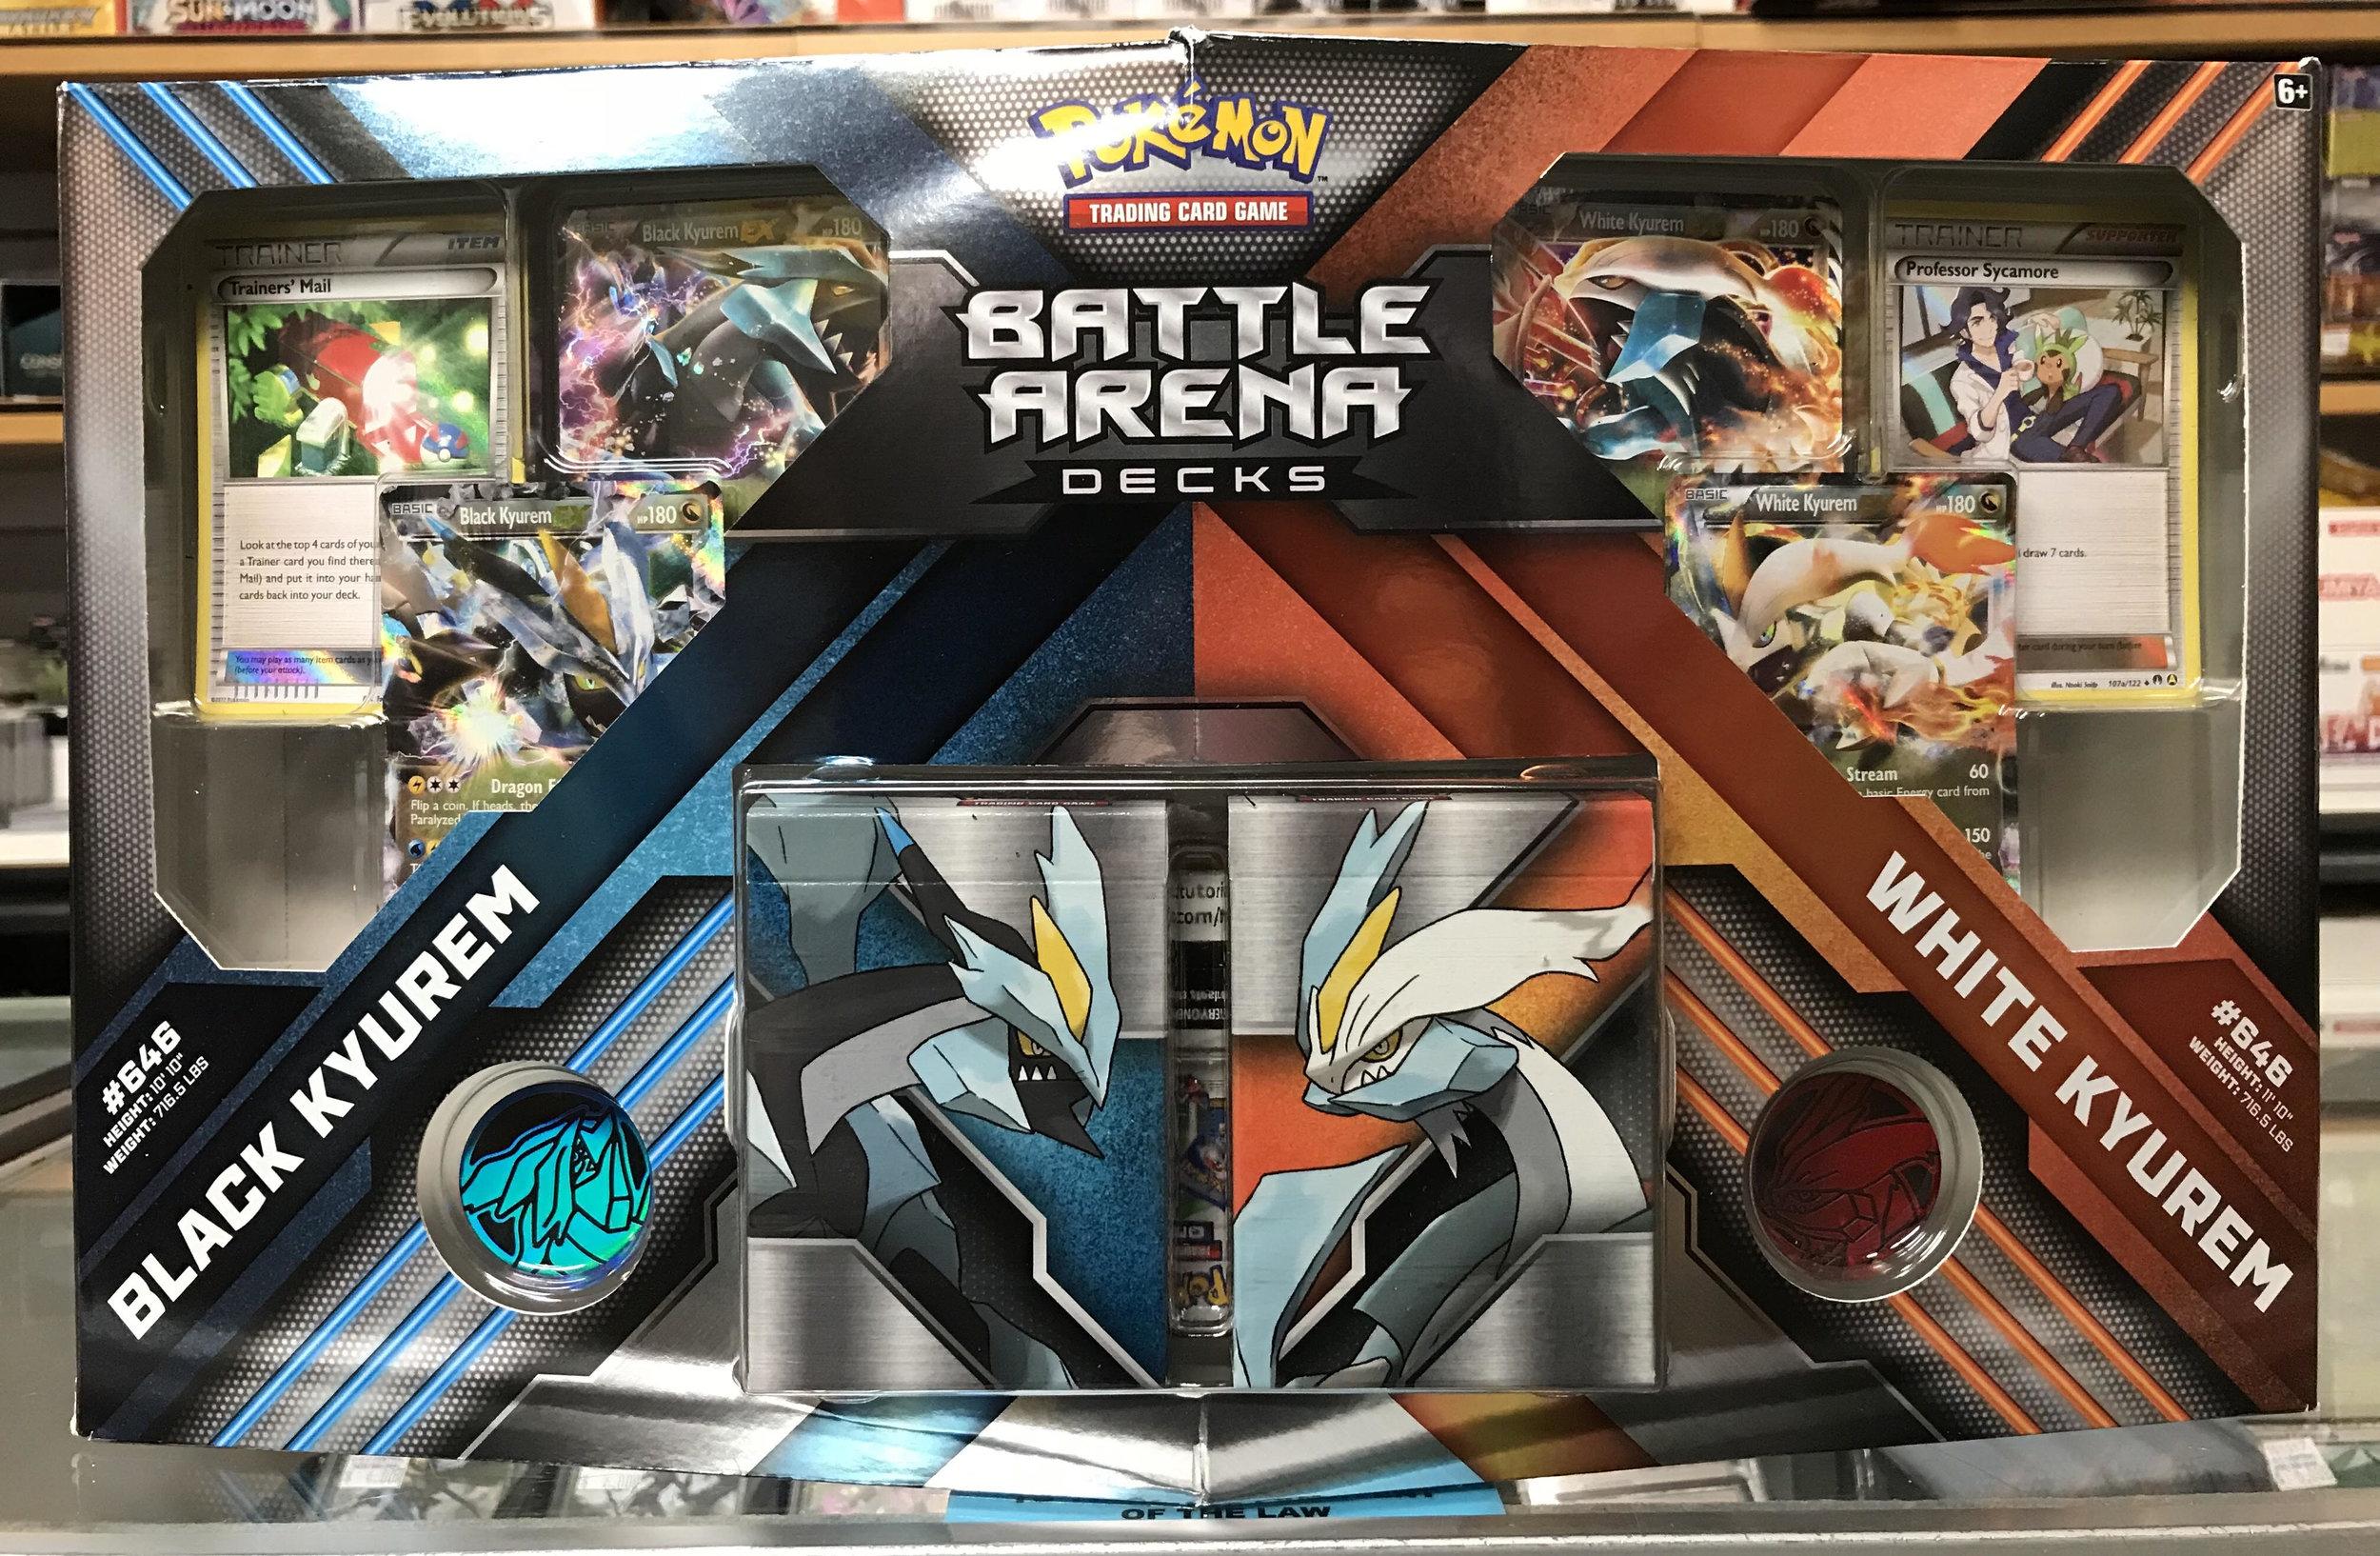 Pokemon Battle Arena Decks. White Kyurem and Black Kyurem